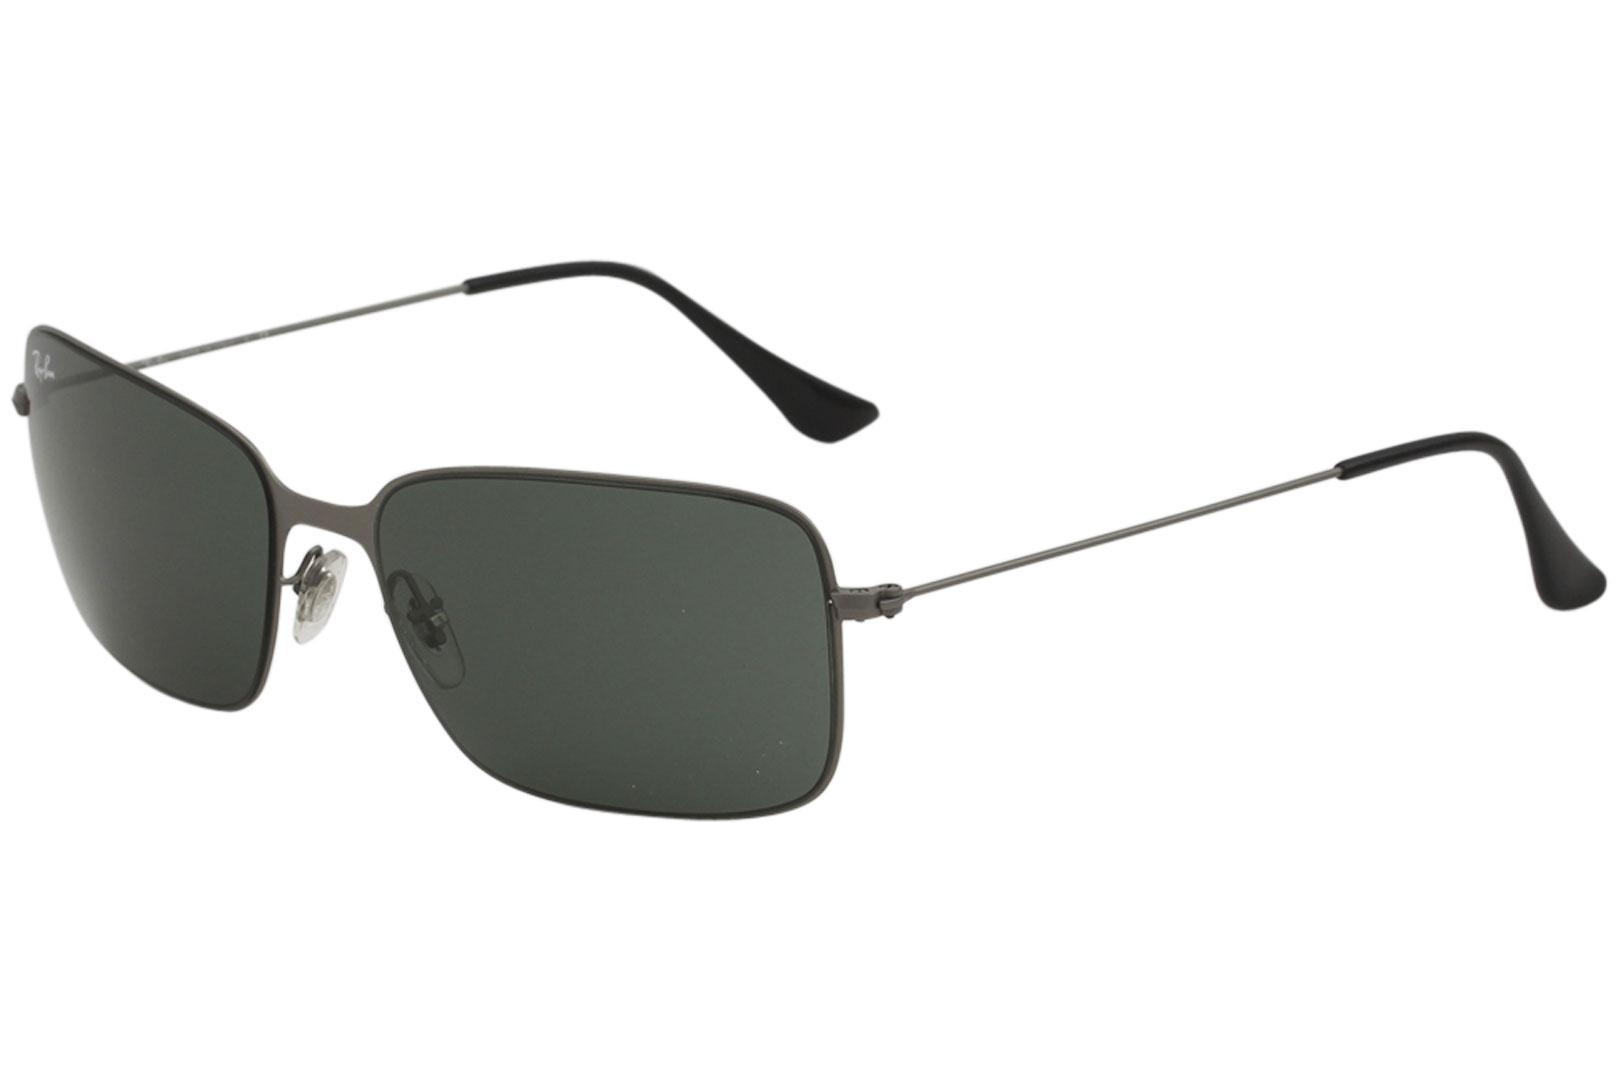 b733a503e8 Ray Ban RB3514 RB 3514 RayBan Fashion Square Sunglasses